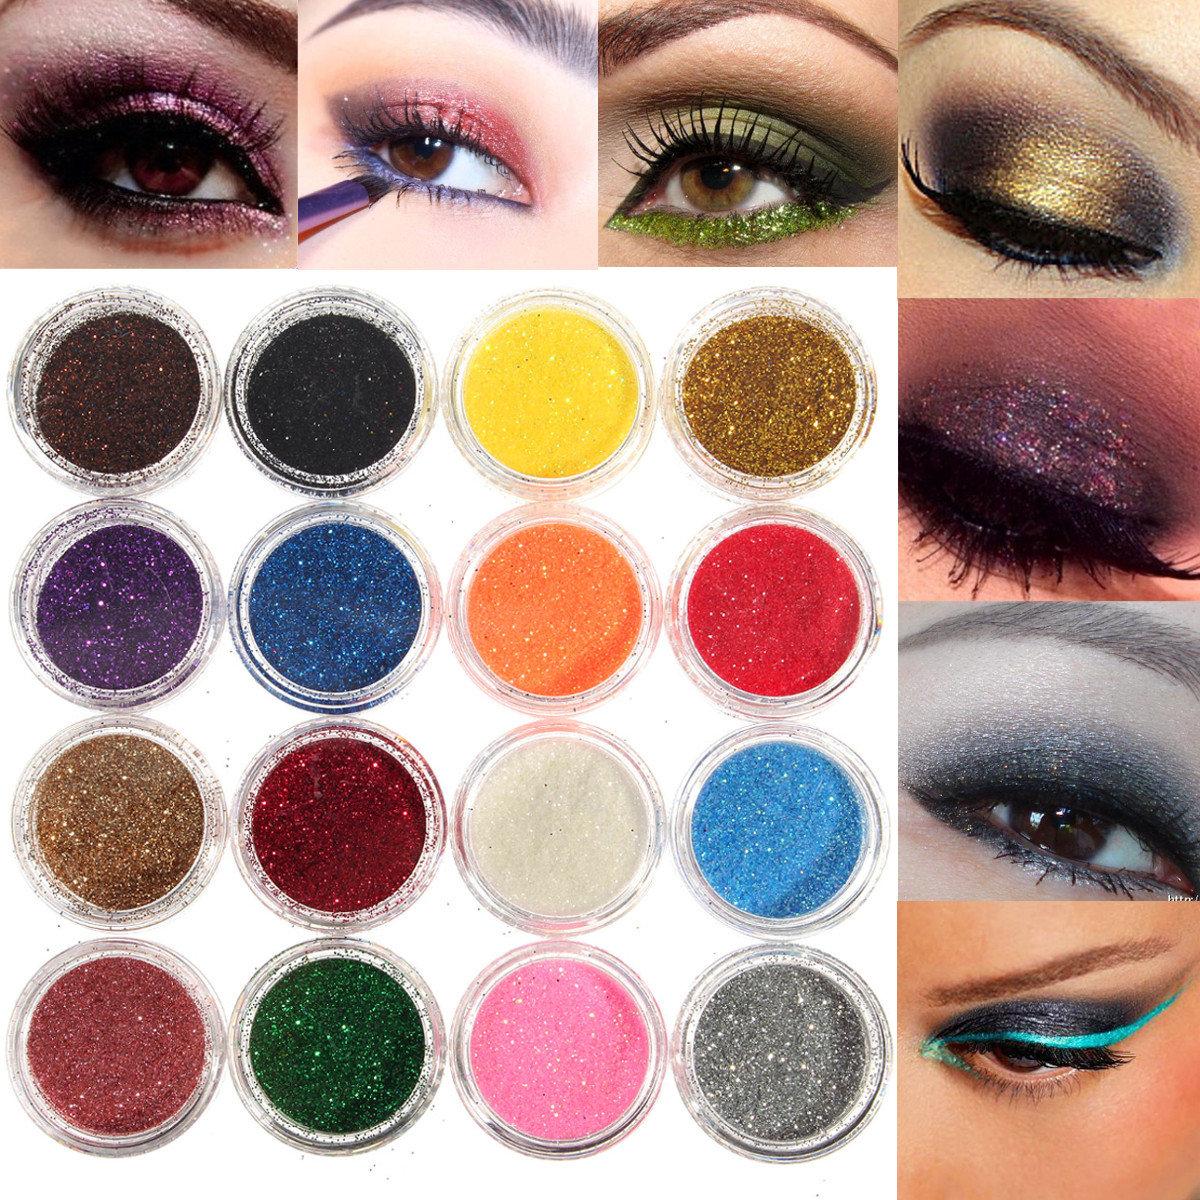 16 Mixed Colors Glitter Powder Eyeshadow Makeup Smoked Eye Shadow Cosmetics Set